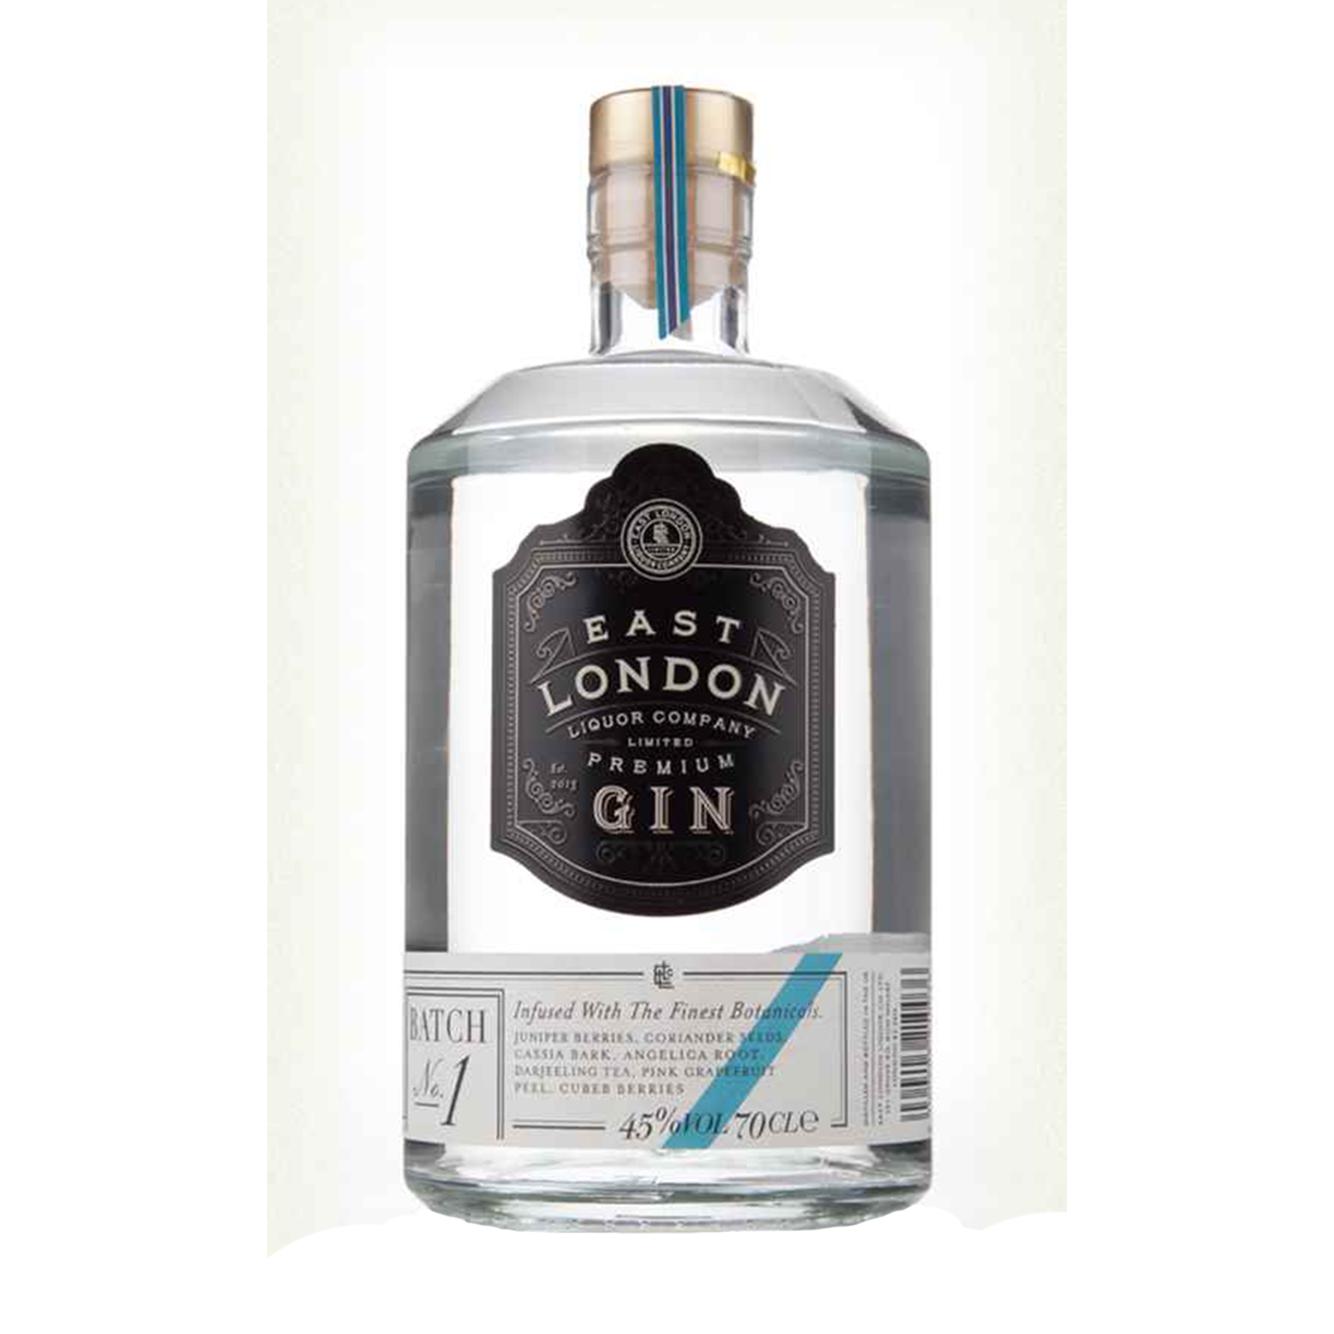 East London Premium Gin